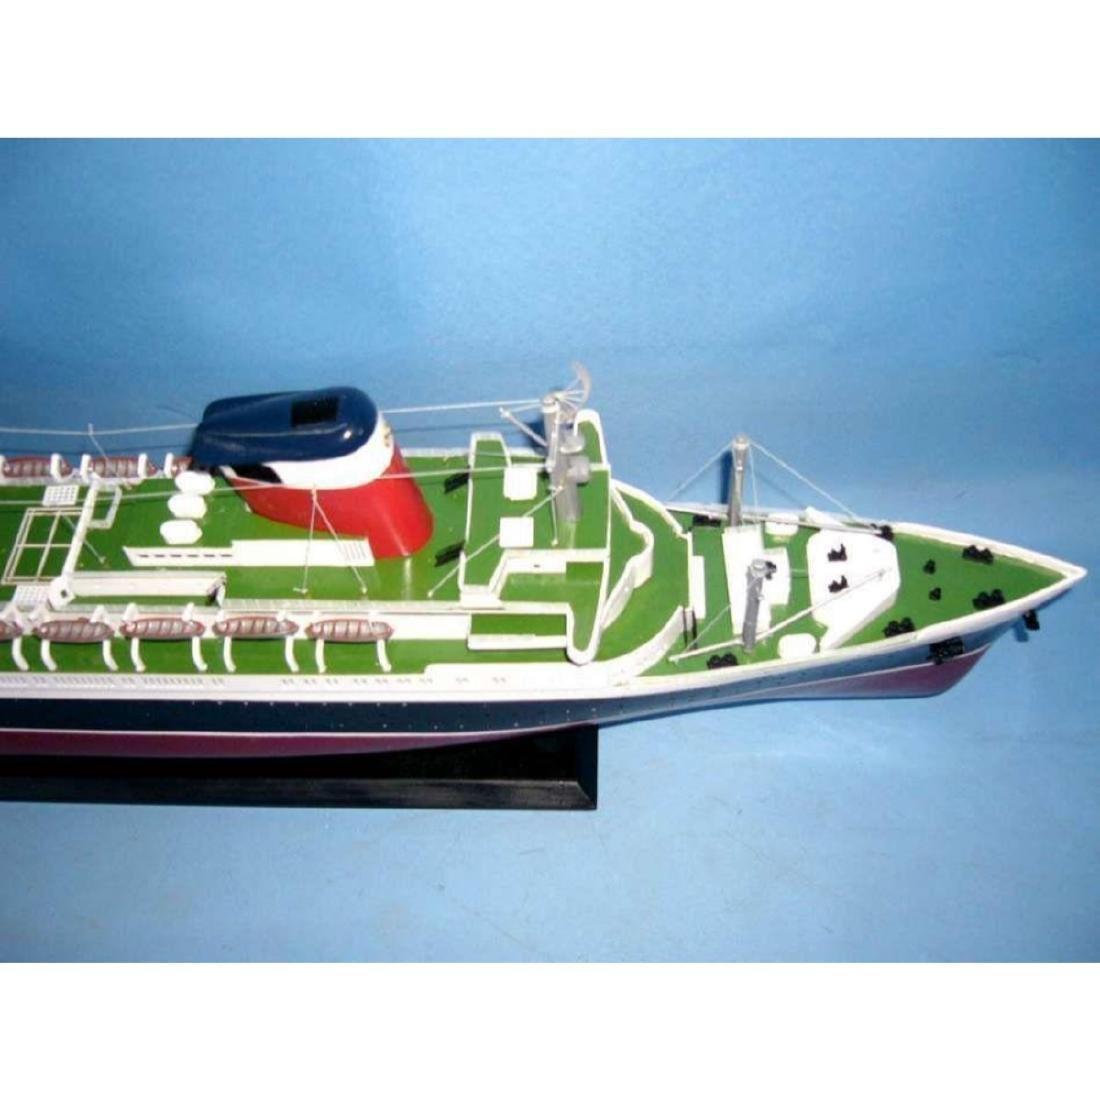 "SS United States Limited Model Cruise Ship 40"" w/ LED - 2"